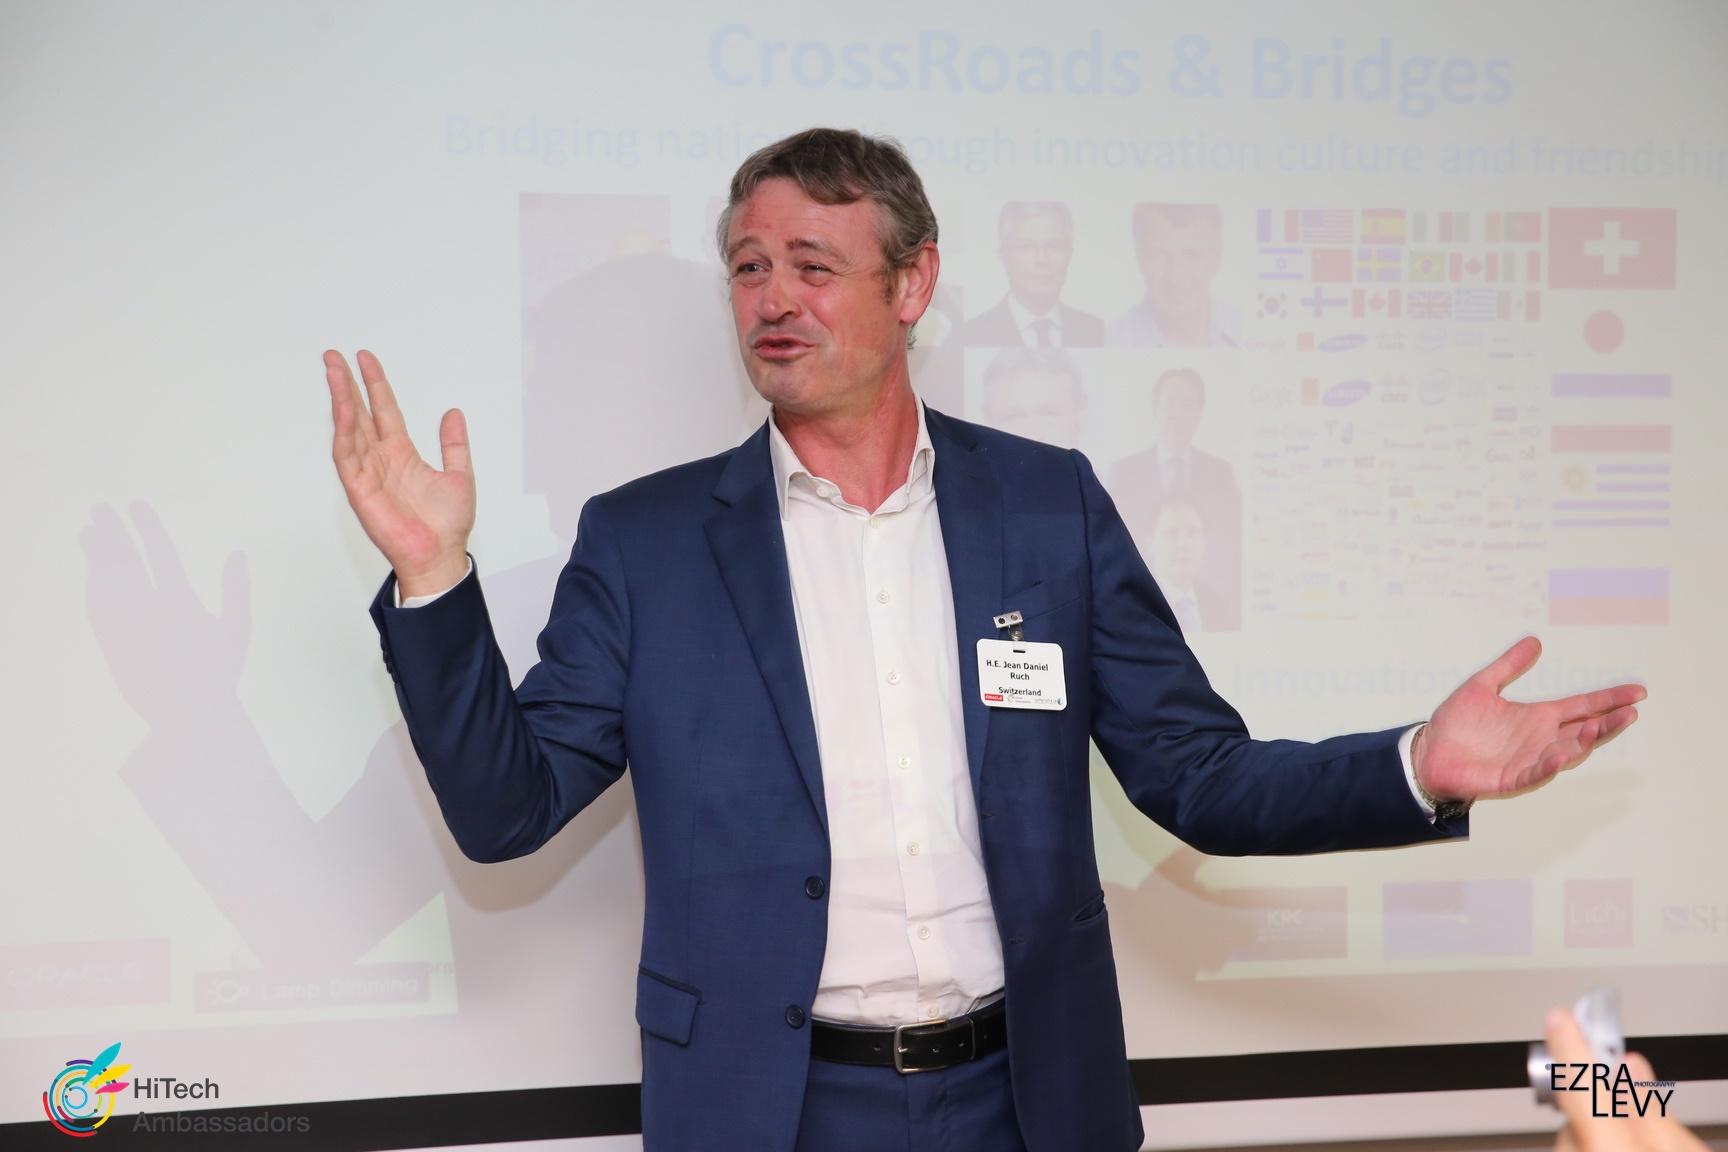 Swiss Ambassador Jean Daniel Ruch